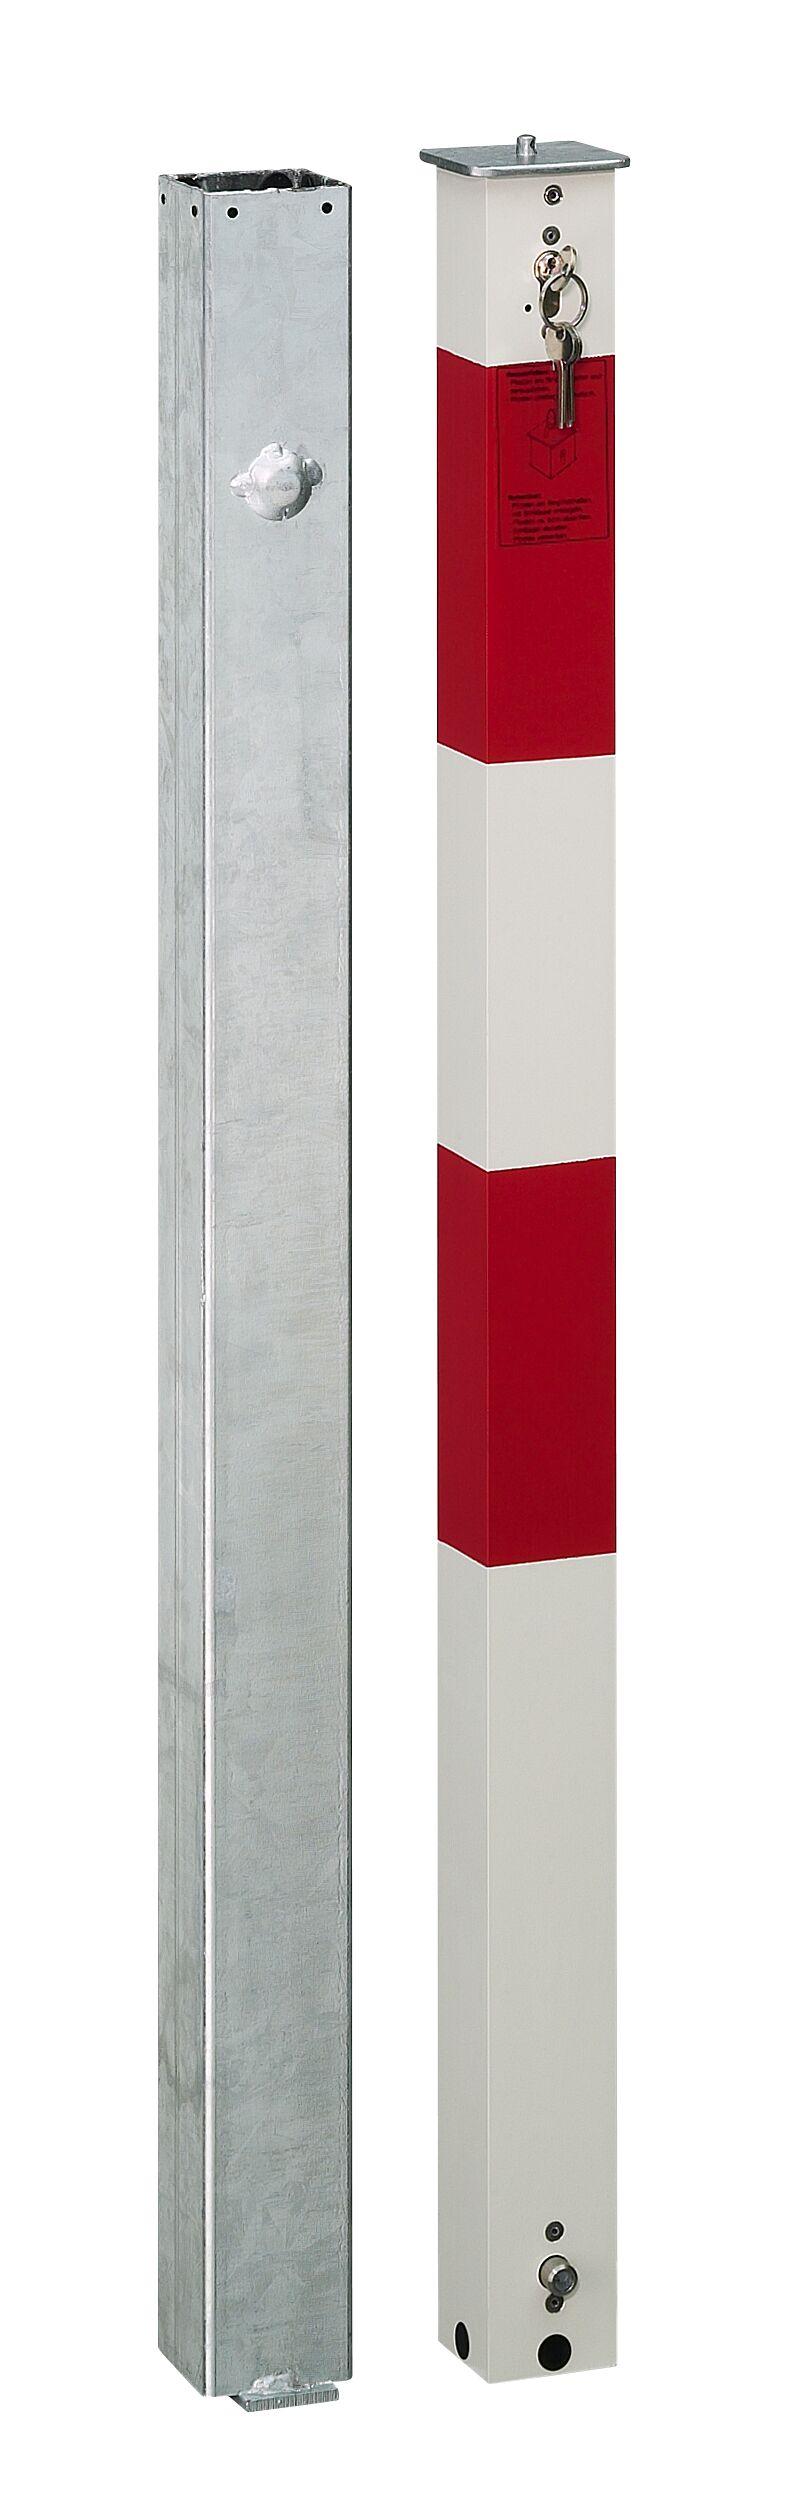 Absperrpfosten 70 x 70 mm aus Aluminium